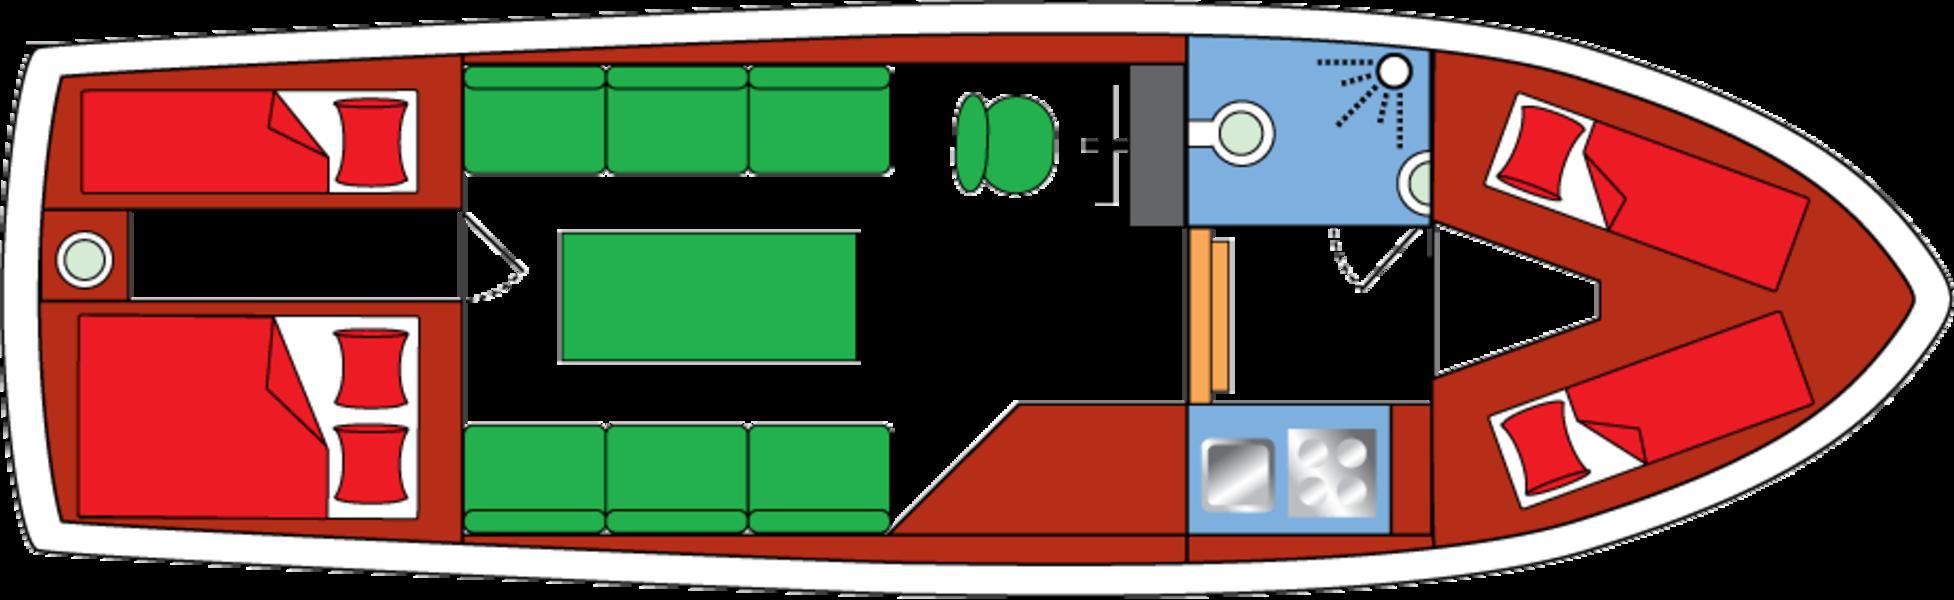 Palan DL 1100 - Albatros